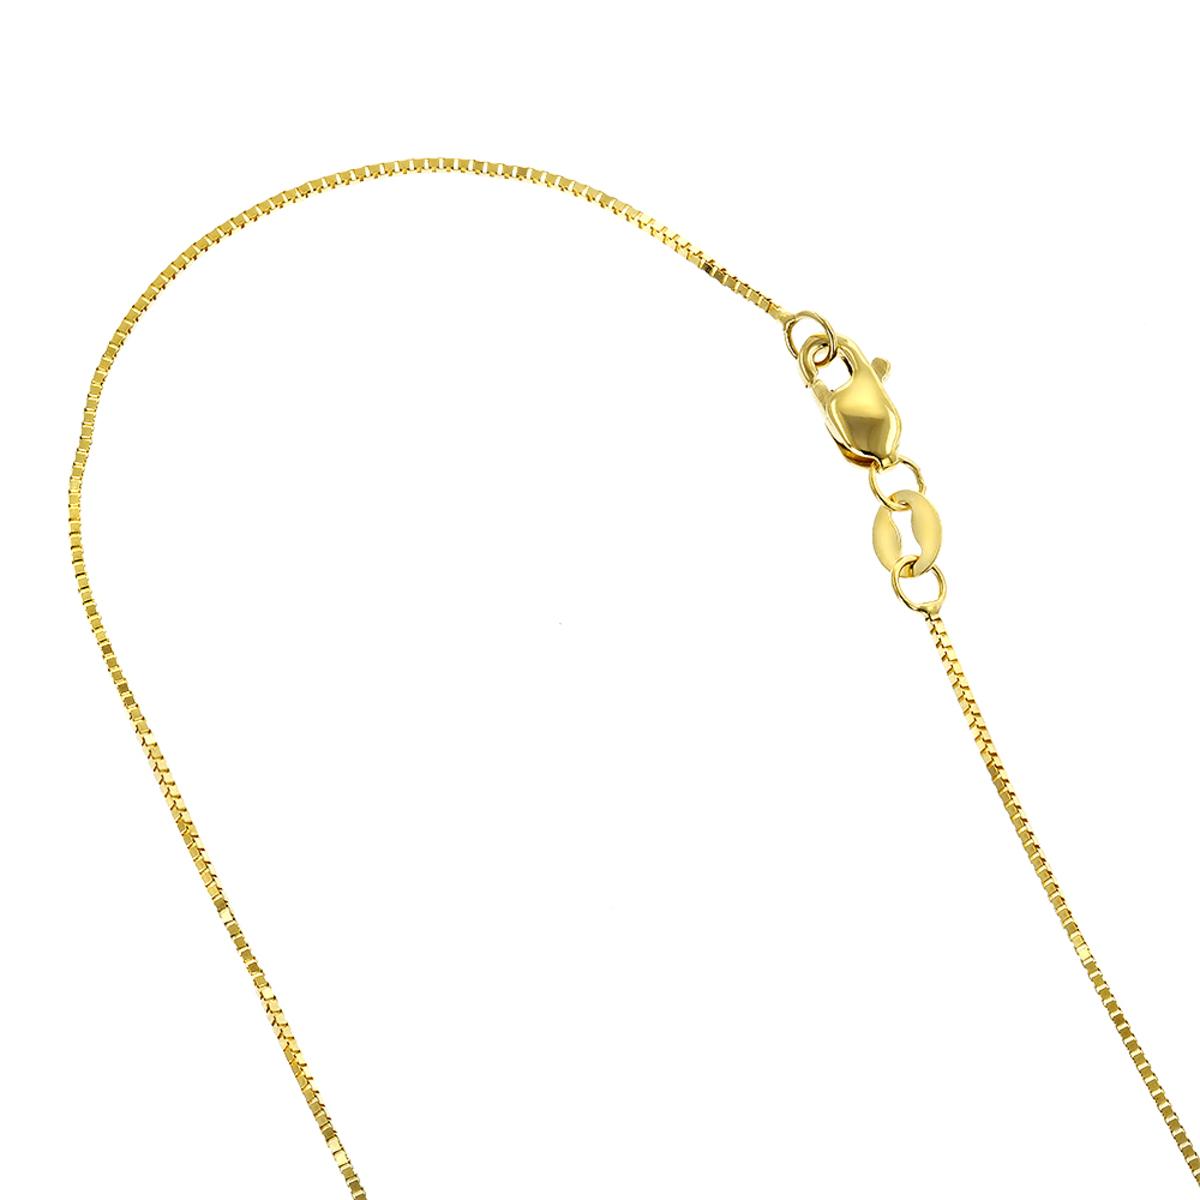 LUXURMAN Solid 14k Gold Box Chain For Women 0.8mm Wide